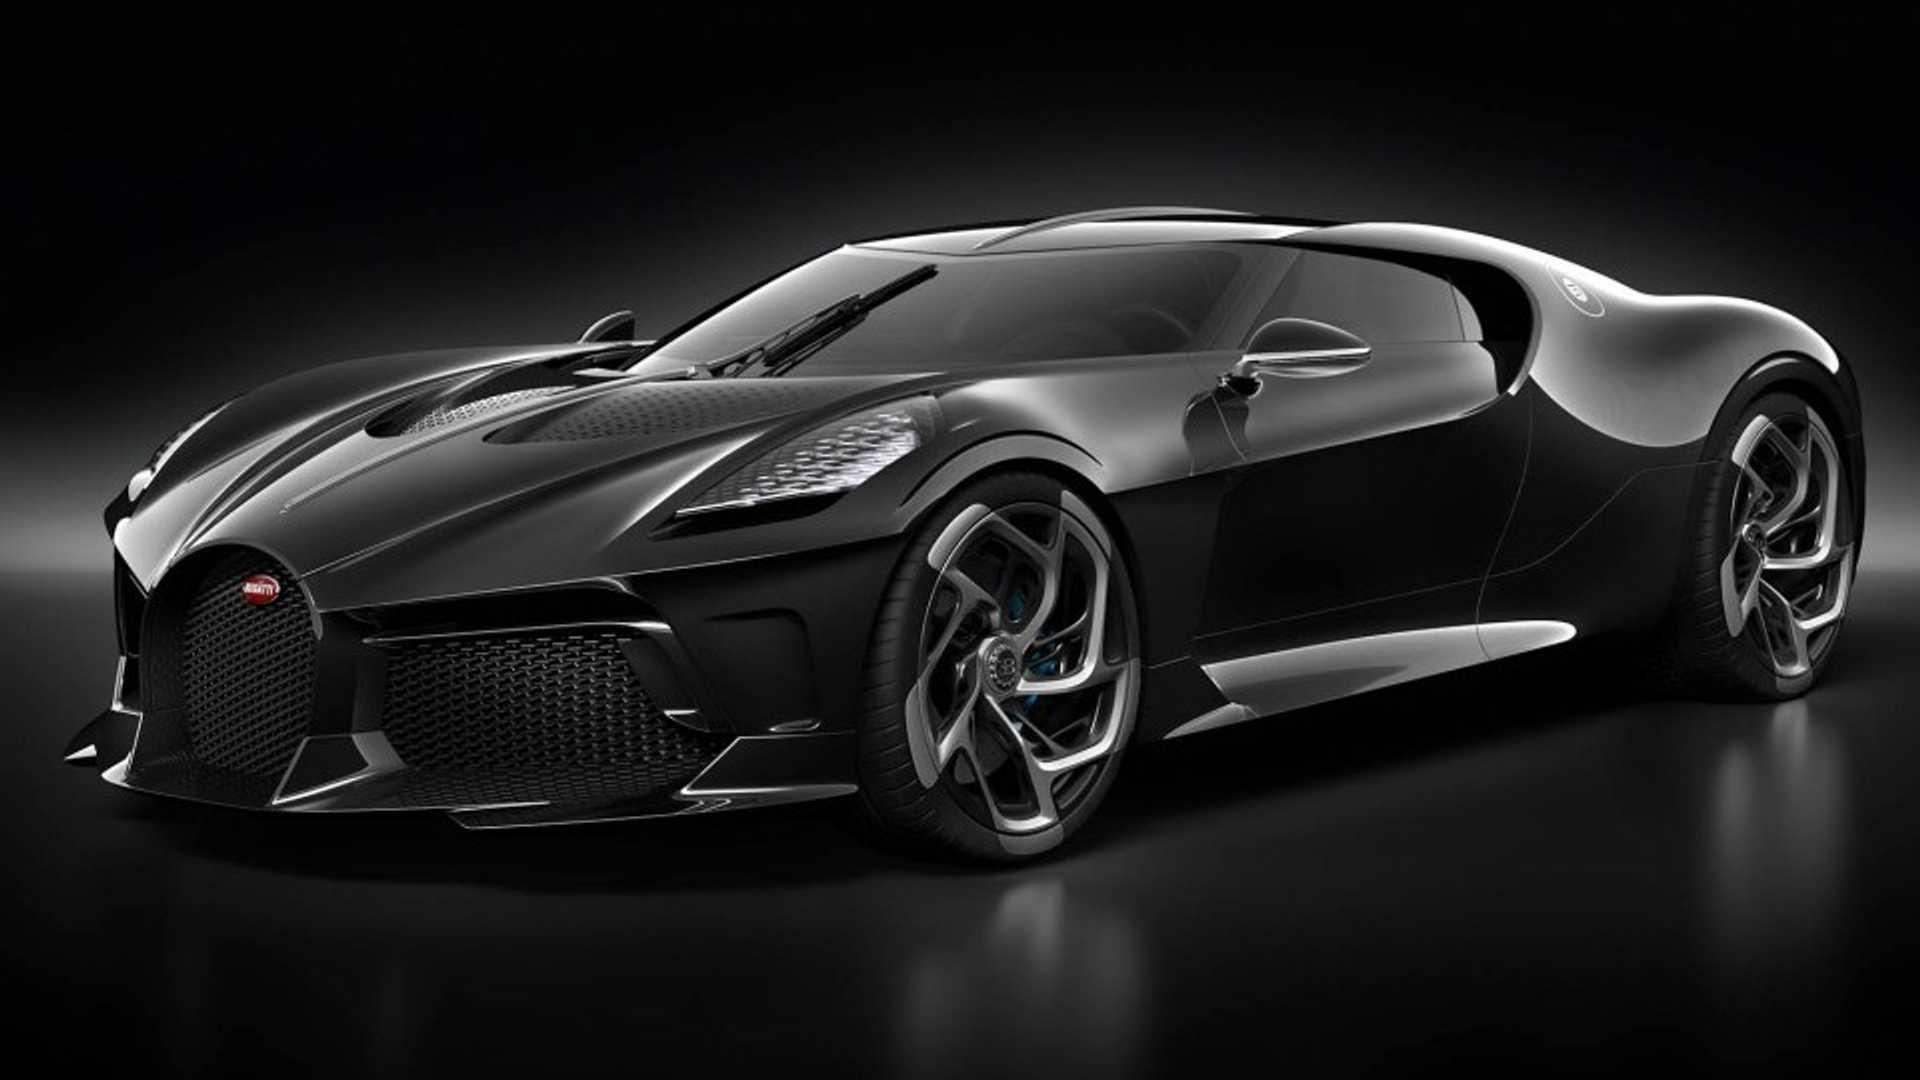 18 7m Bugatti La Voiture Noire Has A Dark Secret